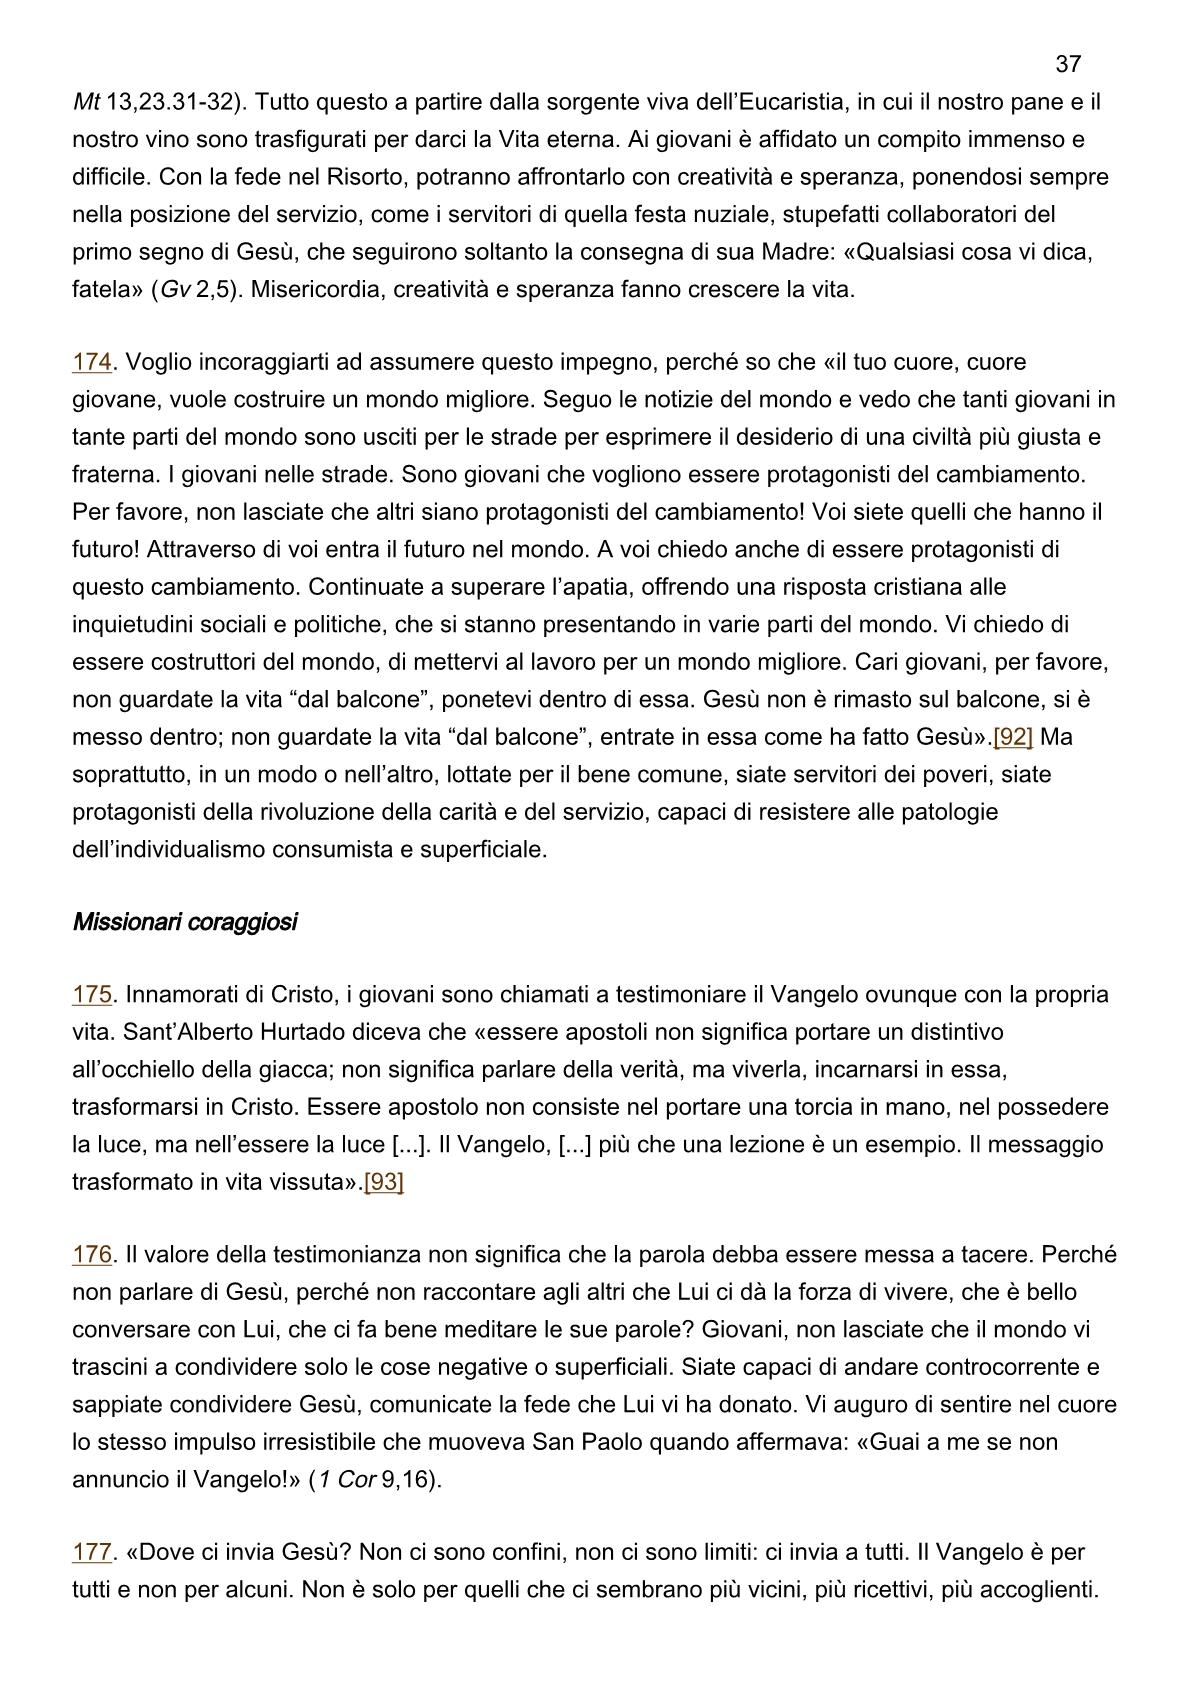 papa-francesco_esortazione-ap_20190325_christus-vivit37